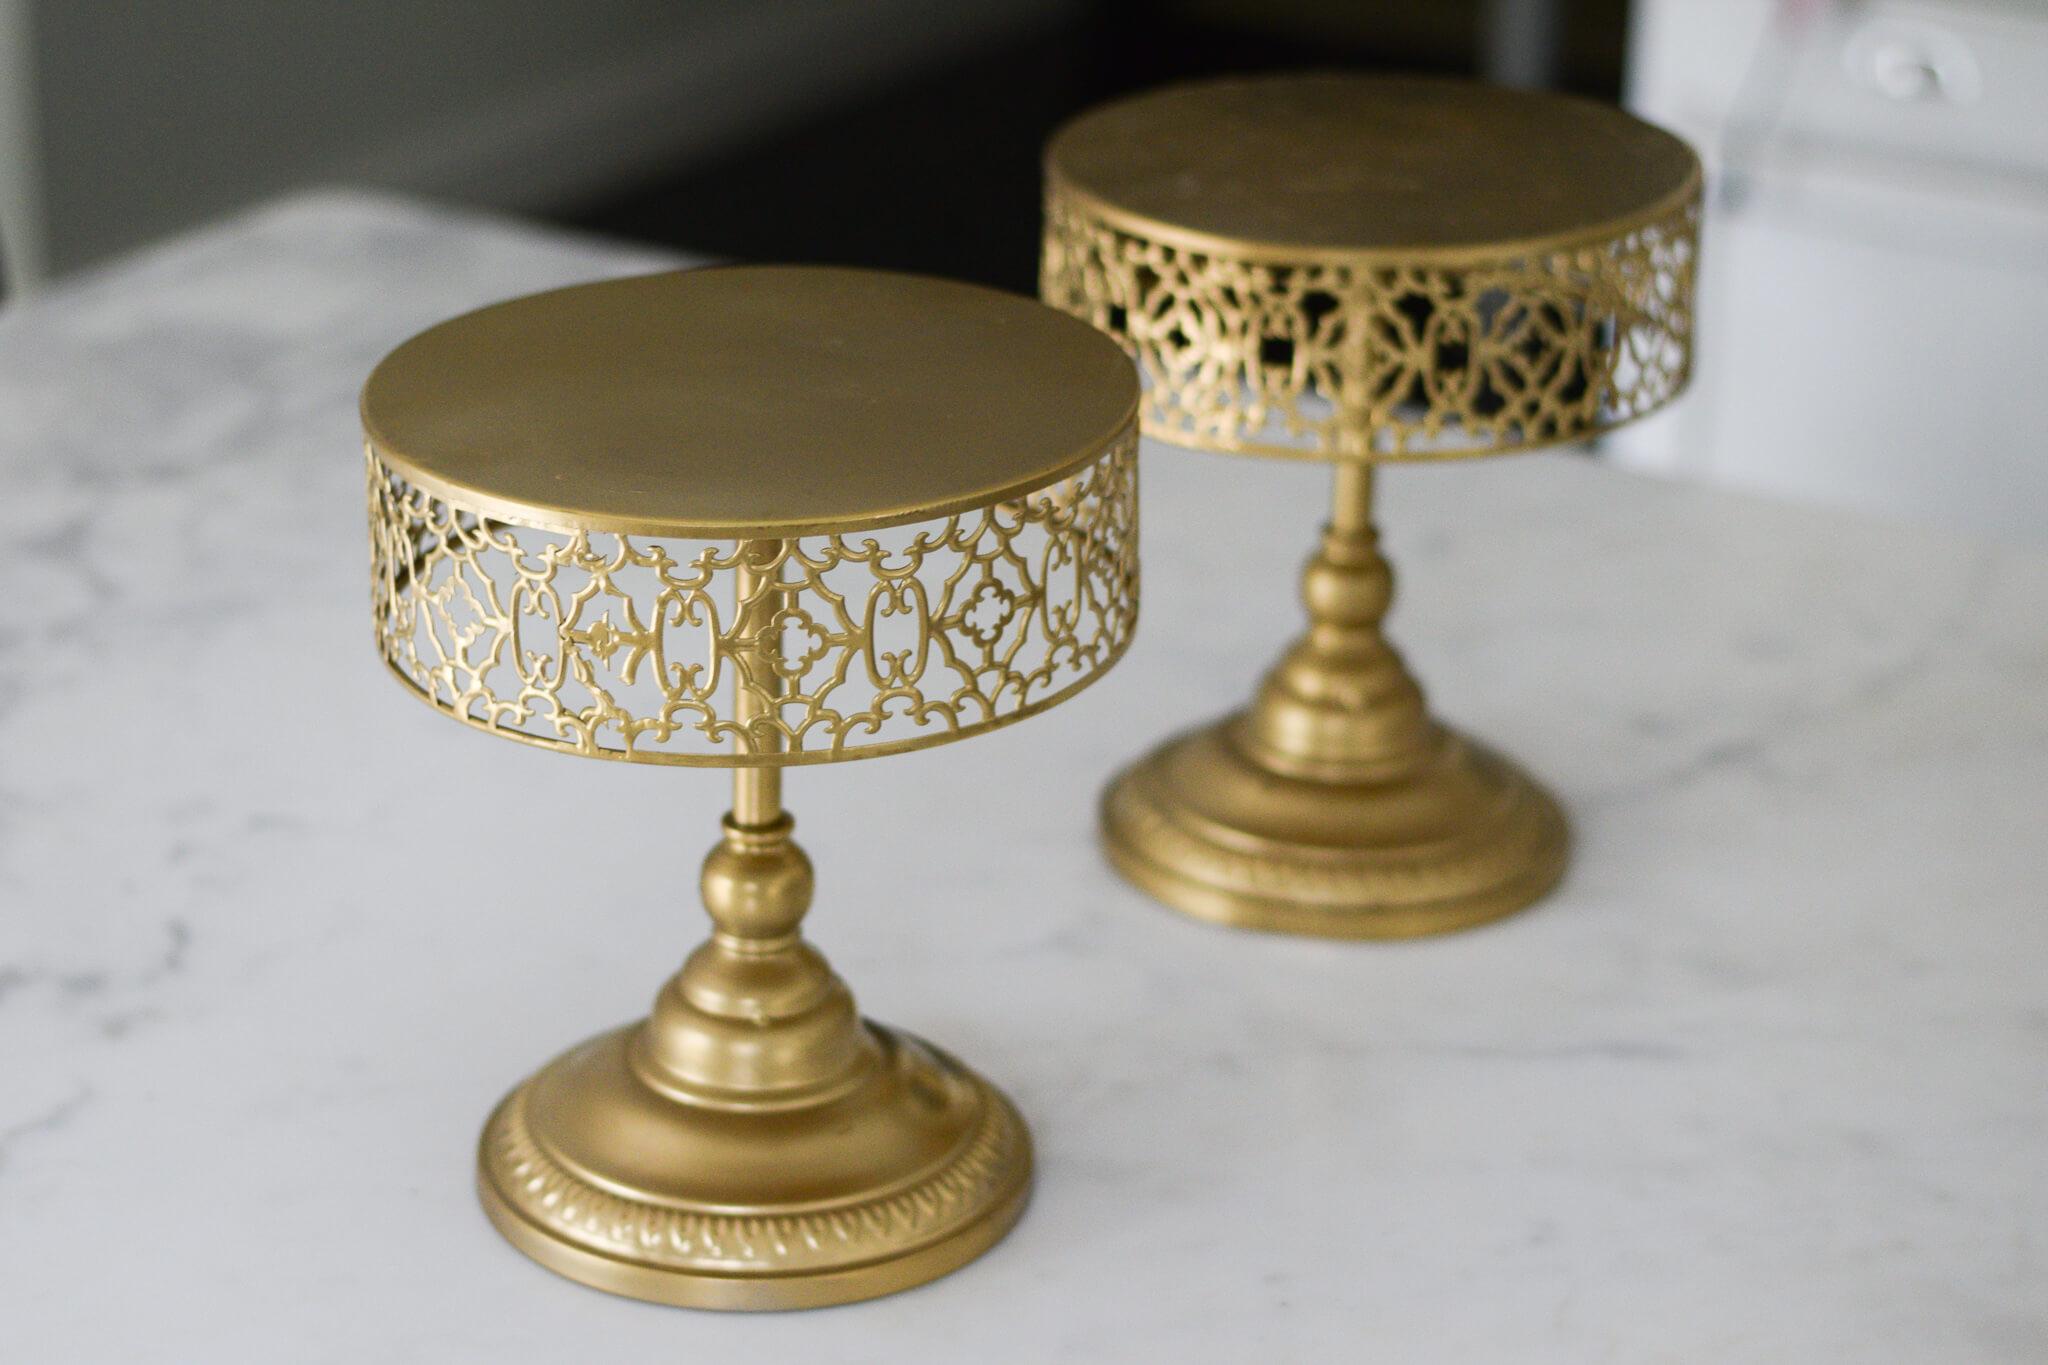 Gold-Cake-Stand-9.jpg